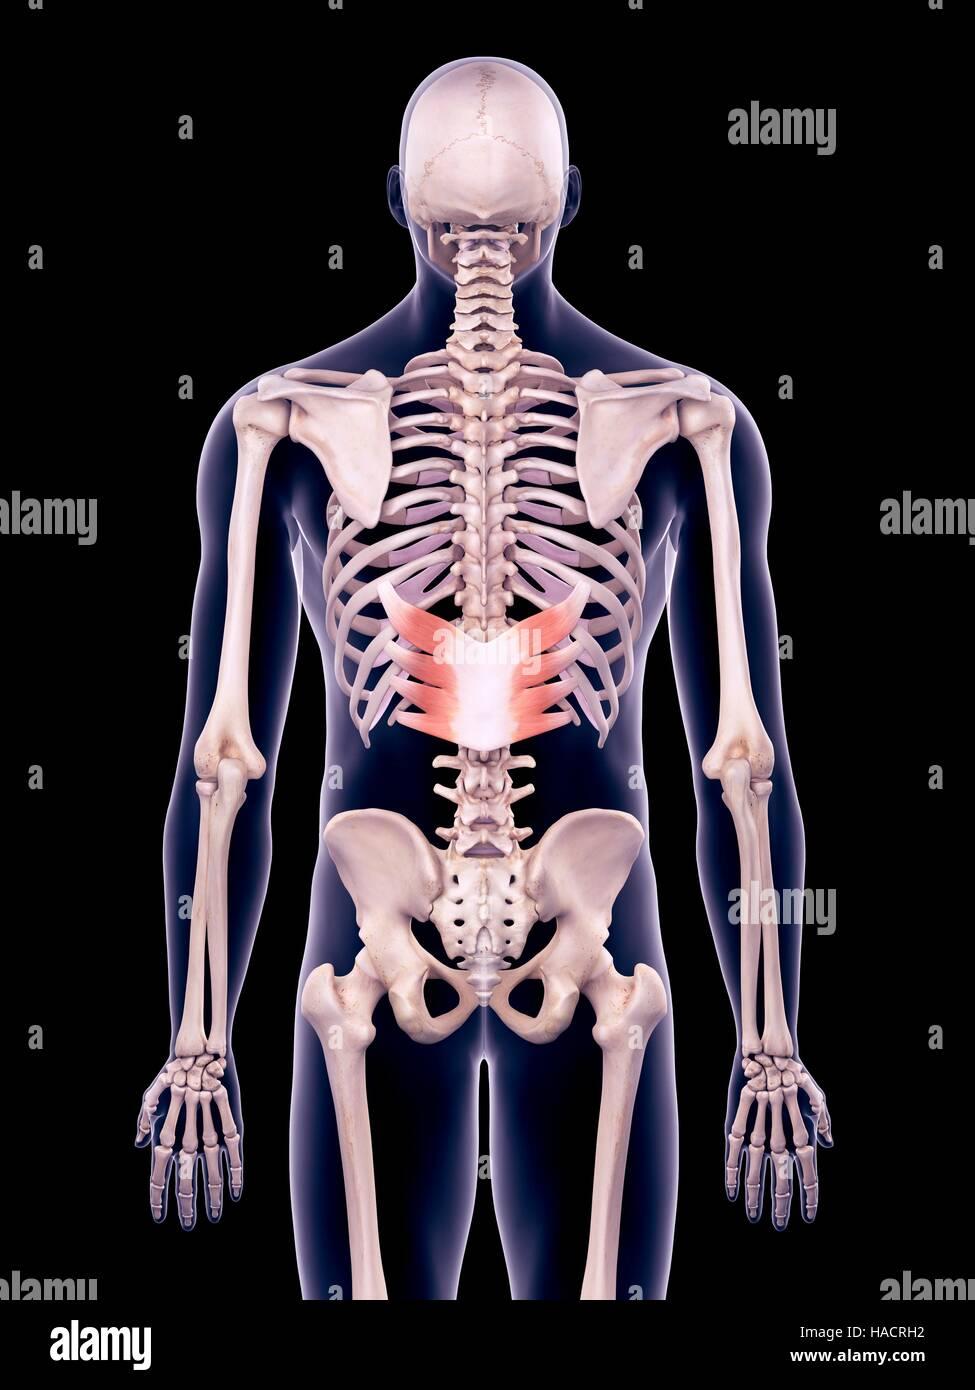 Illustration of the serratus posterior inferior muscles. - Stock Image